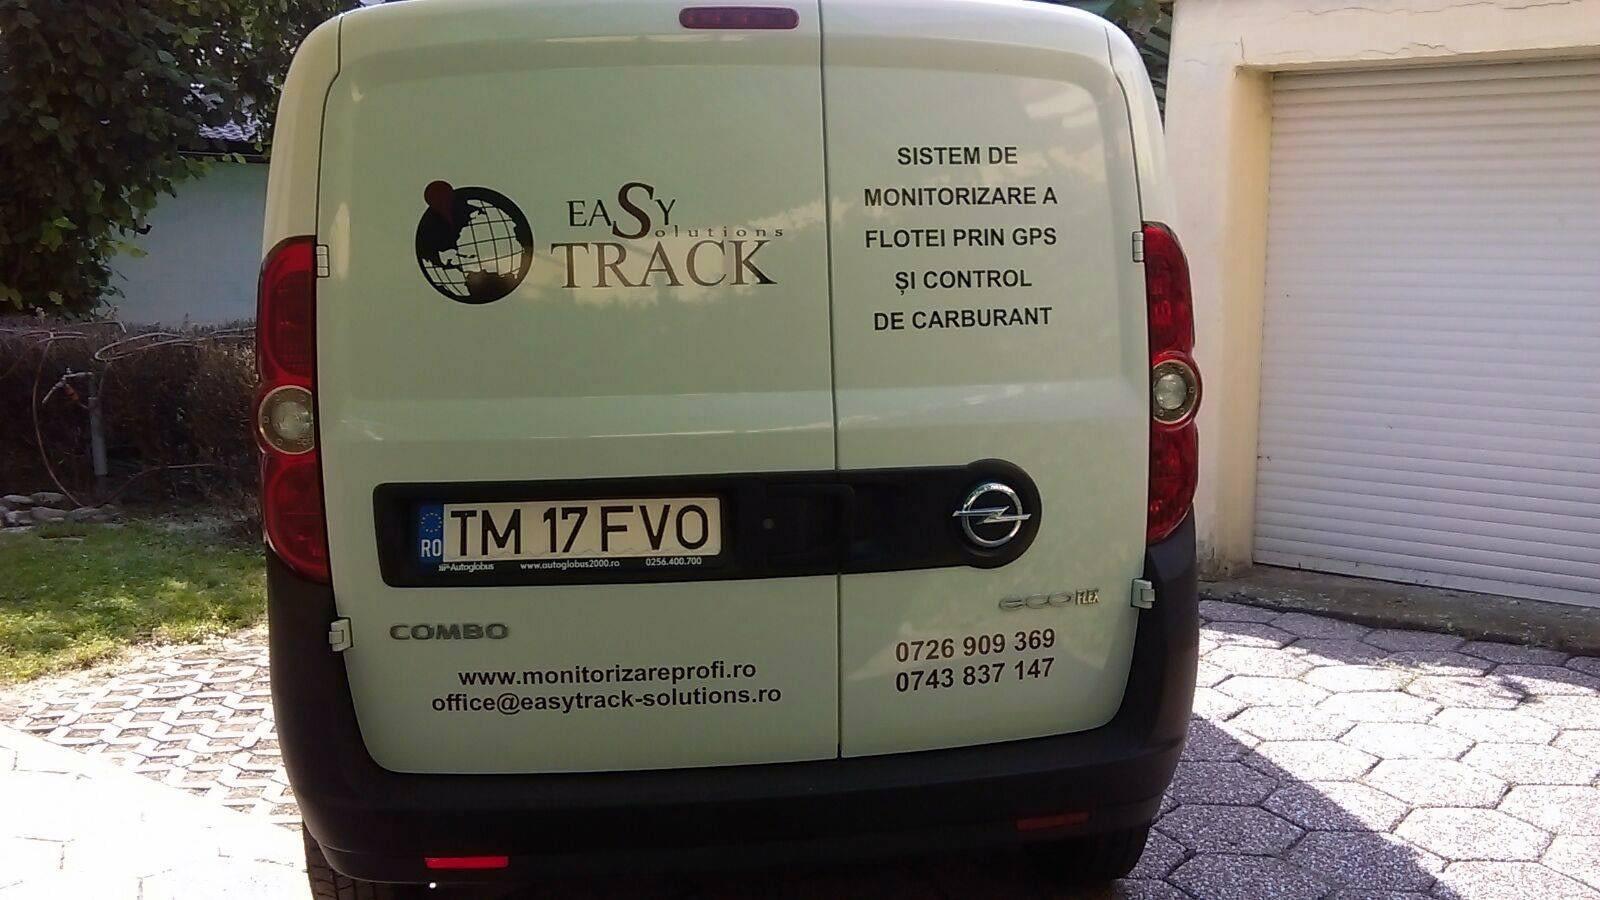 inscripționare auto easy track solutions